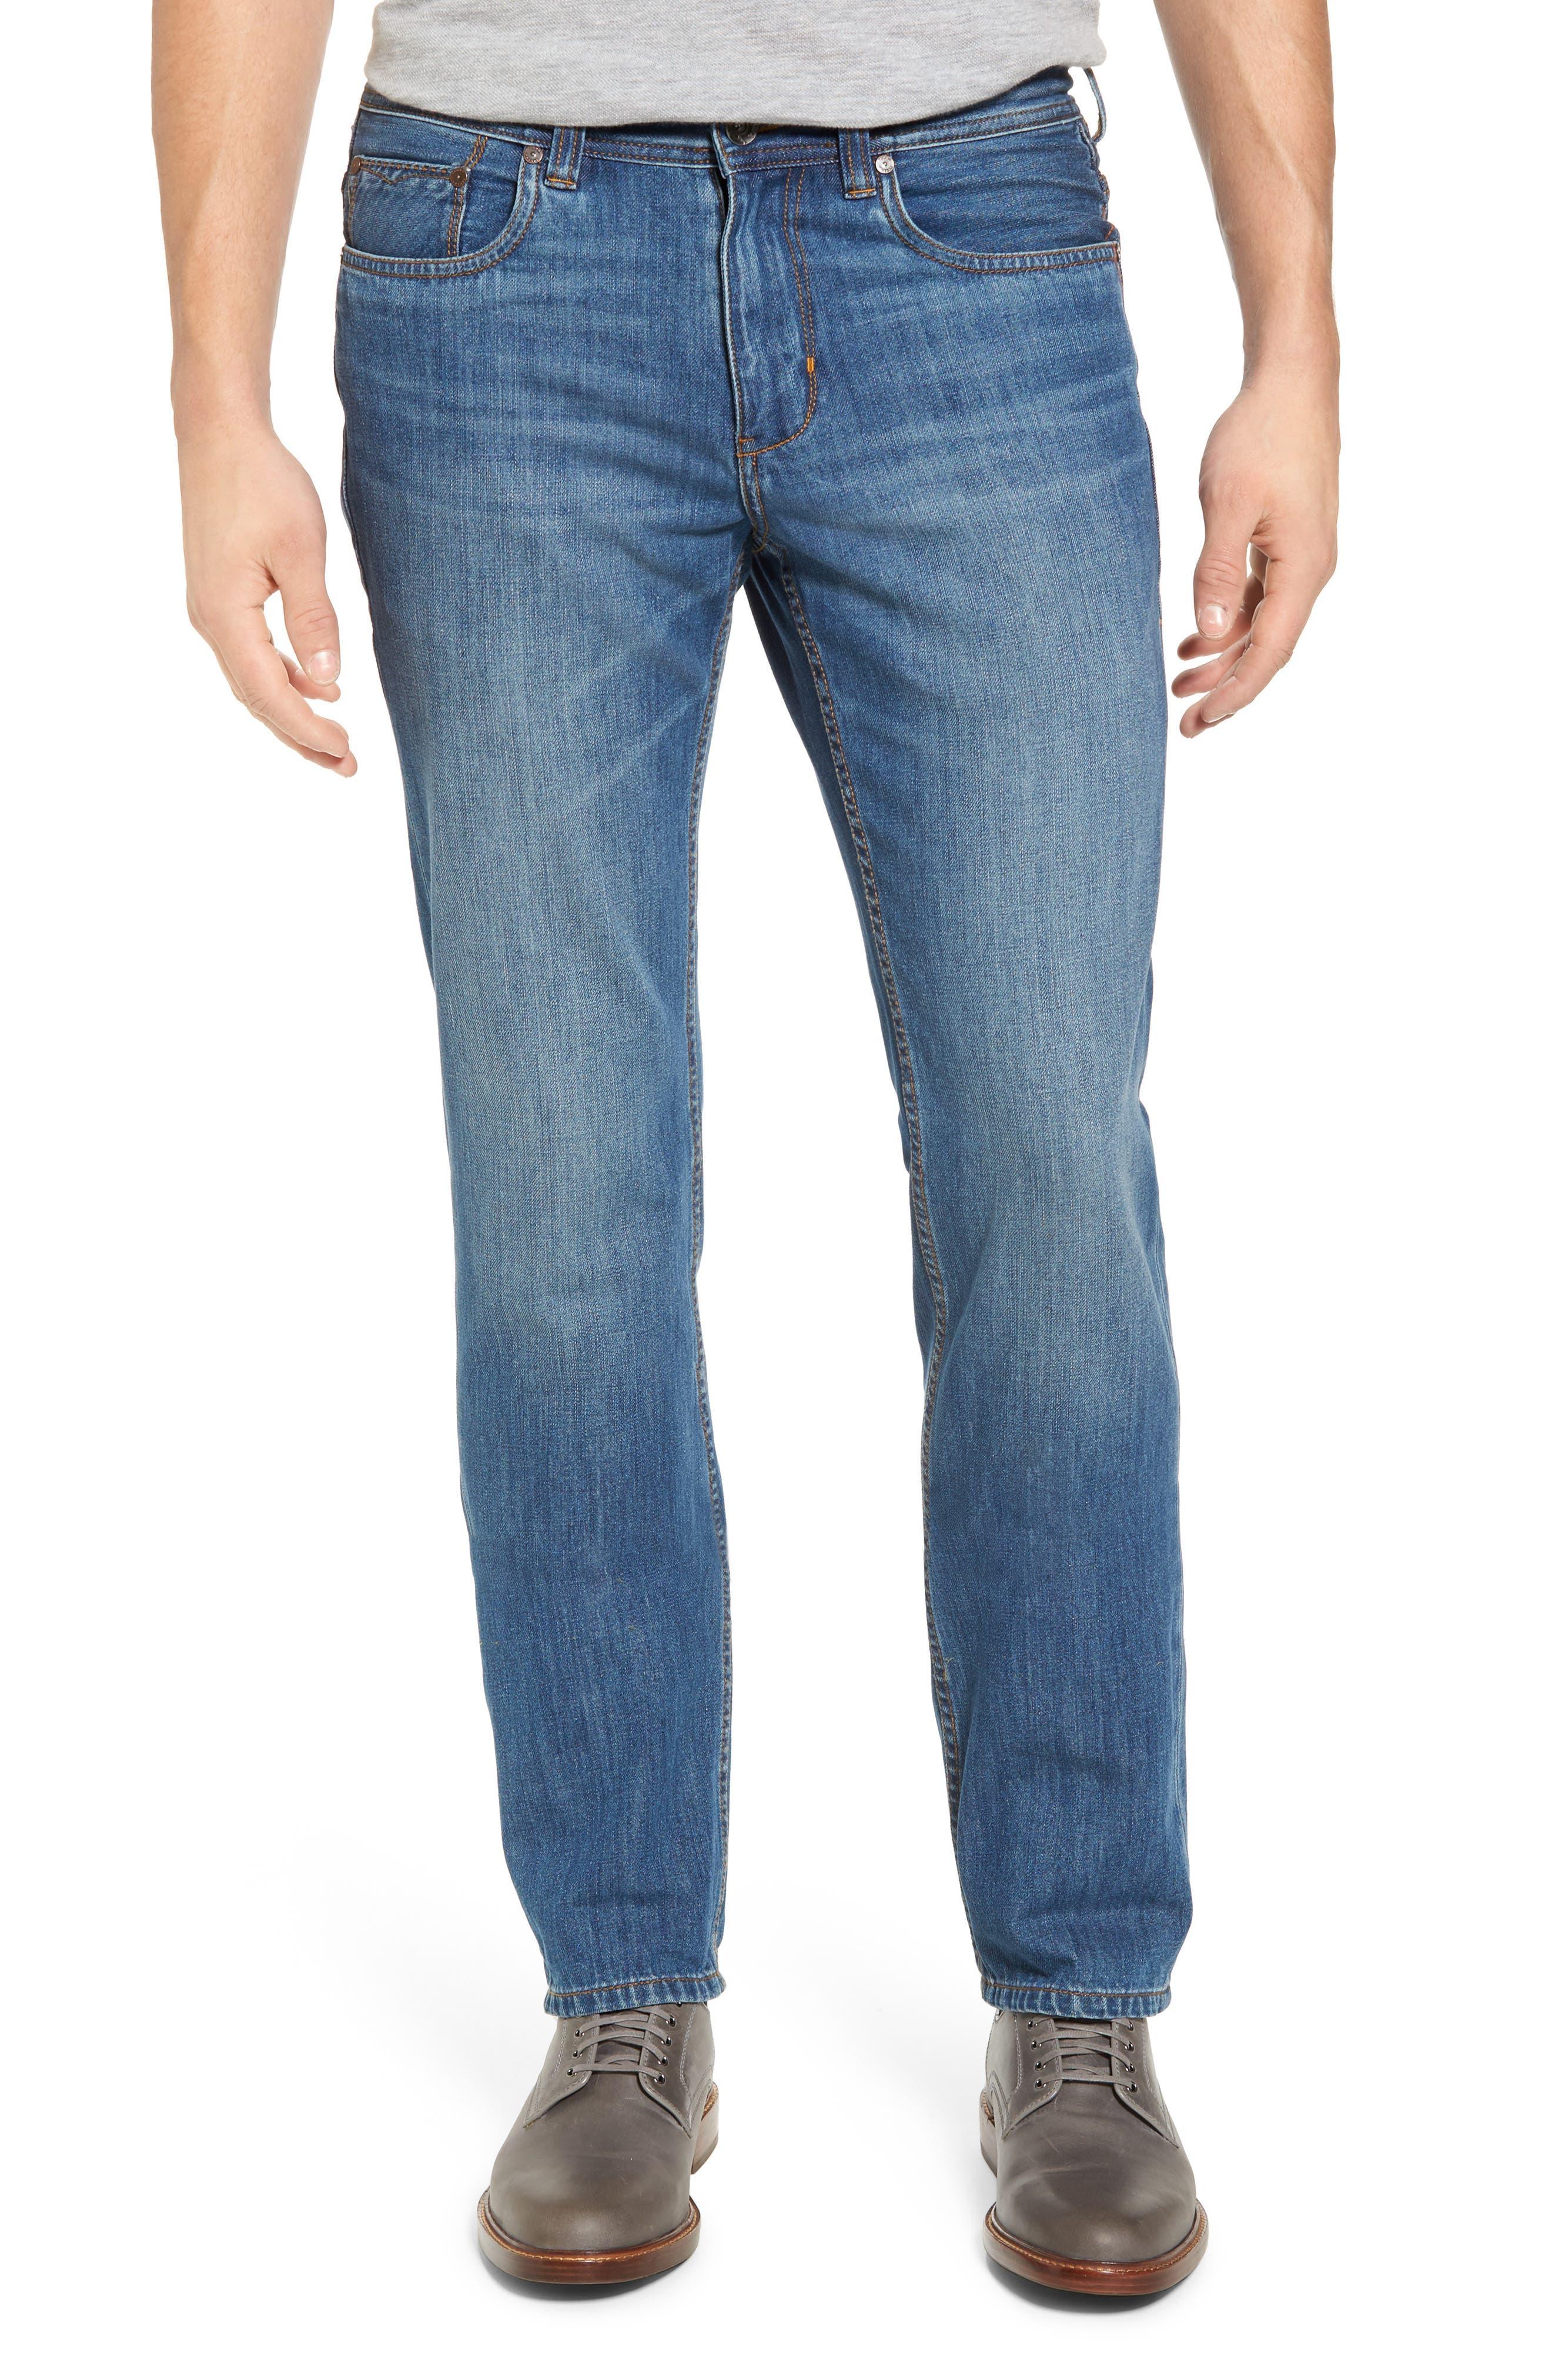 Bardabos Straight Leg Jeans,                         Main,                         color,